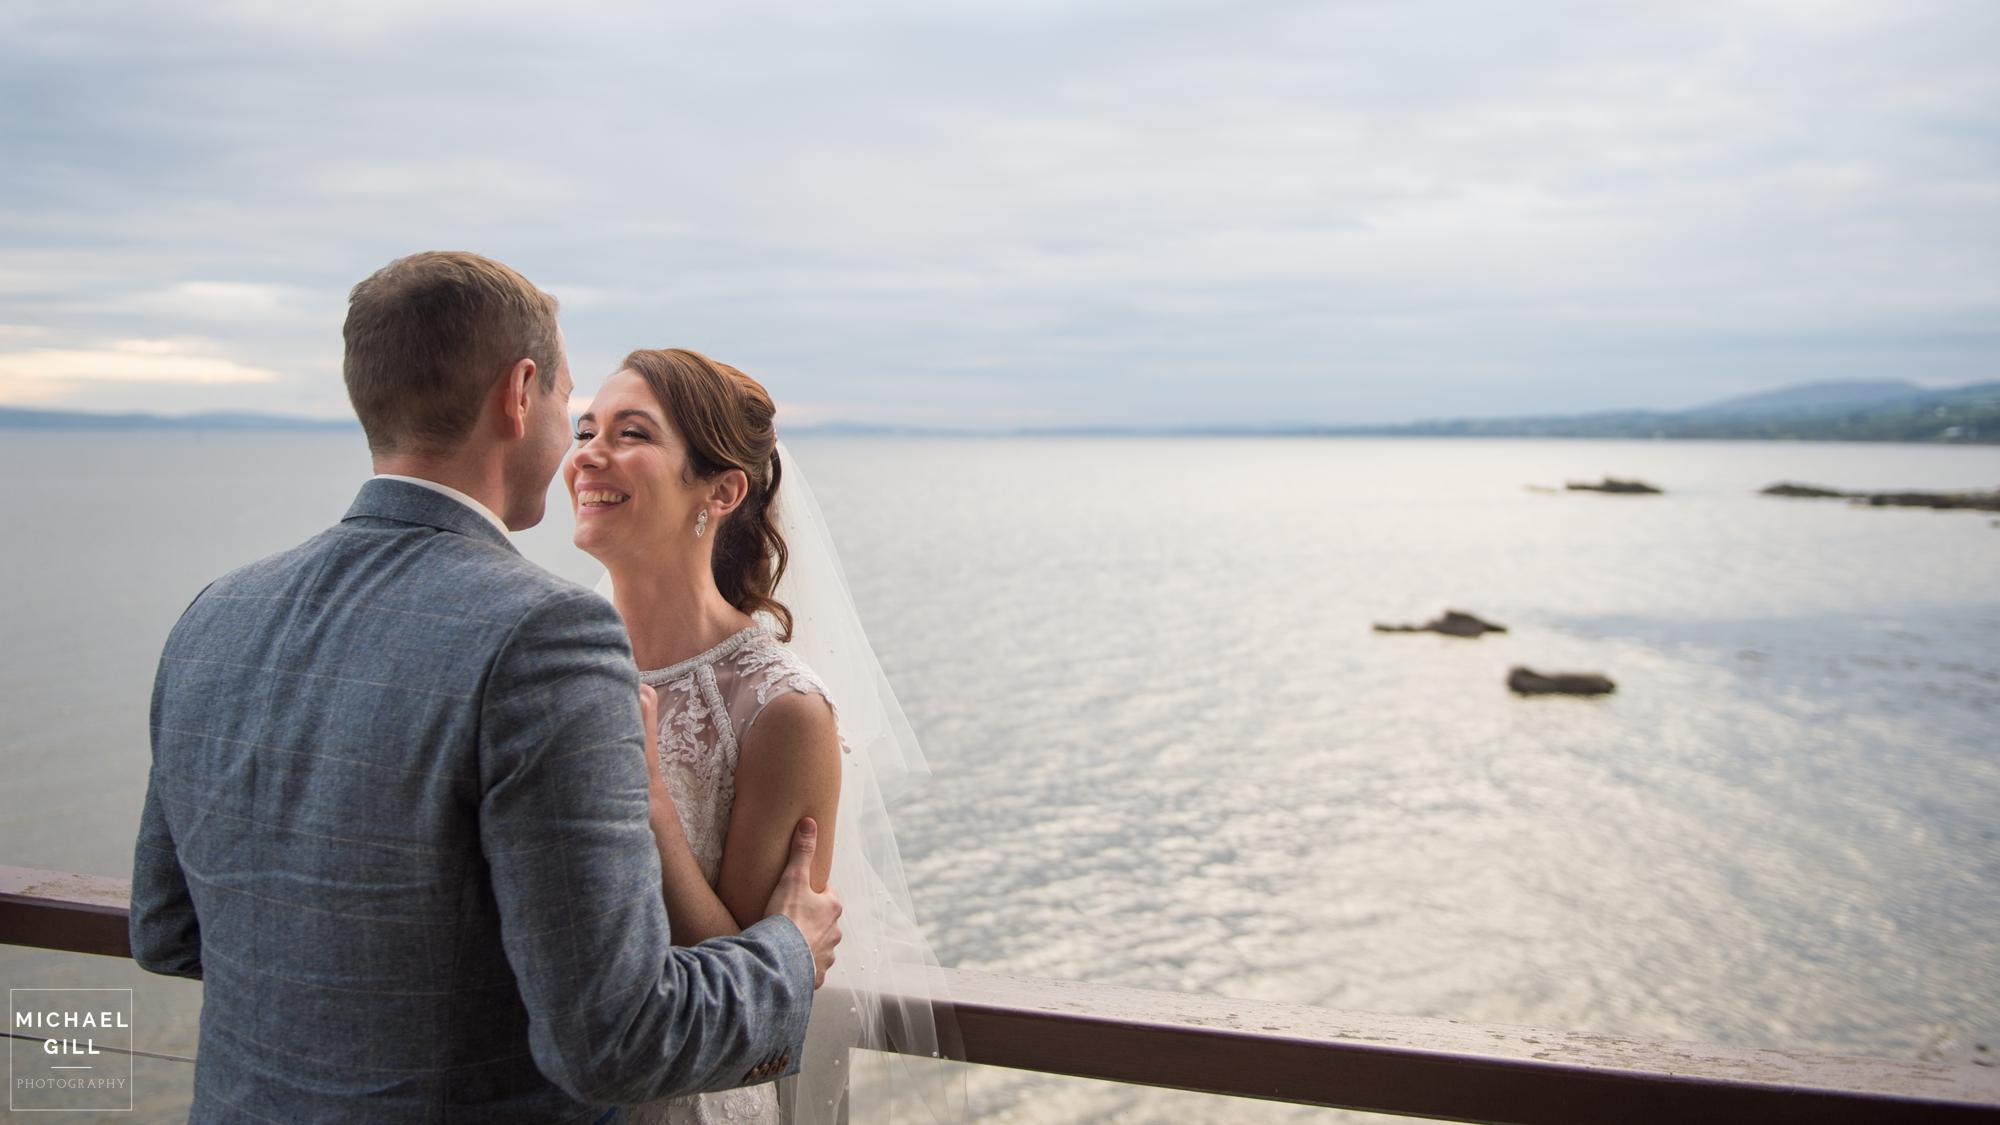 Michael_Gill_Photography_Kinnego_Redcastle_Hotel_Wedding0 (1).jpg